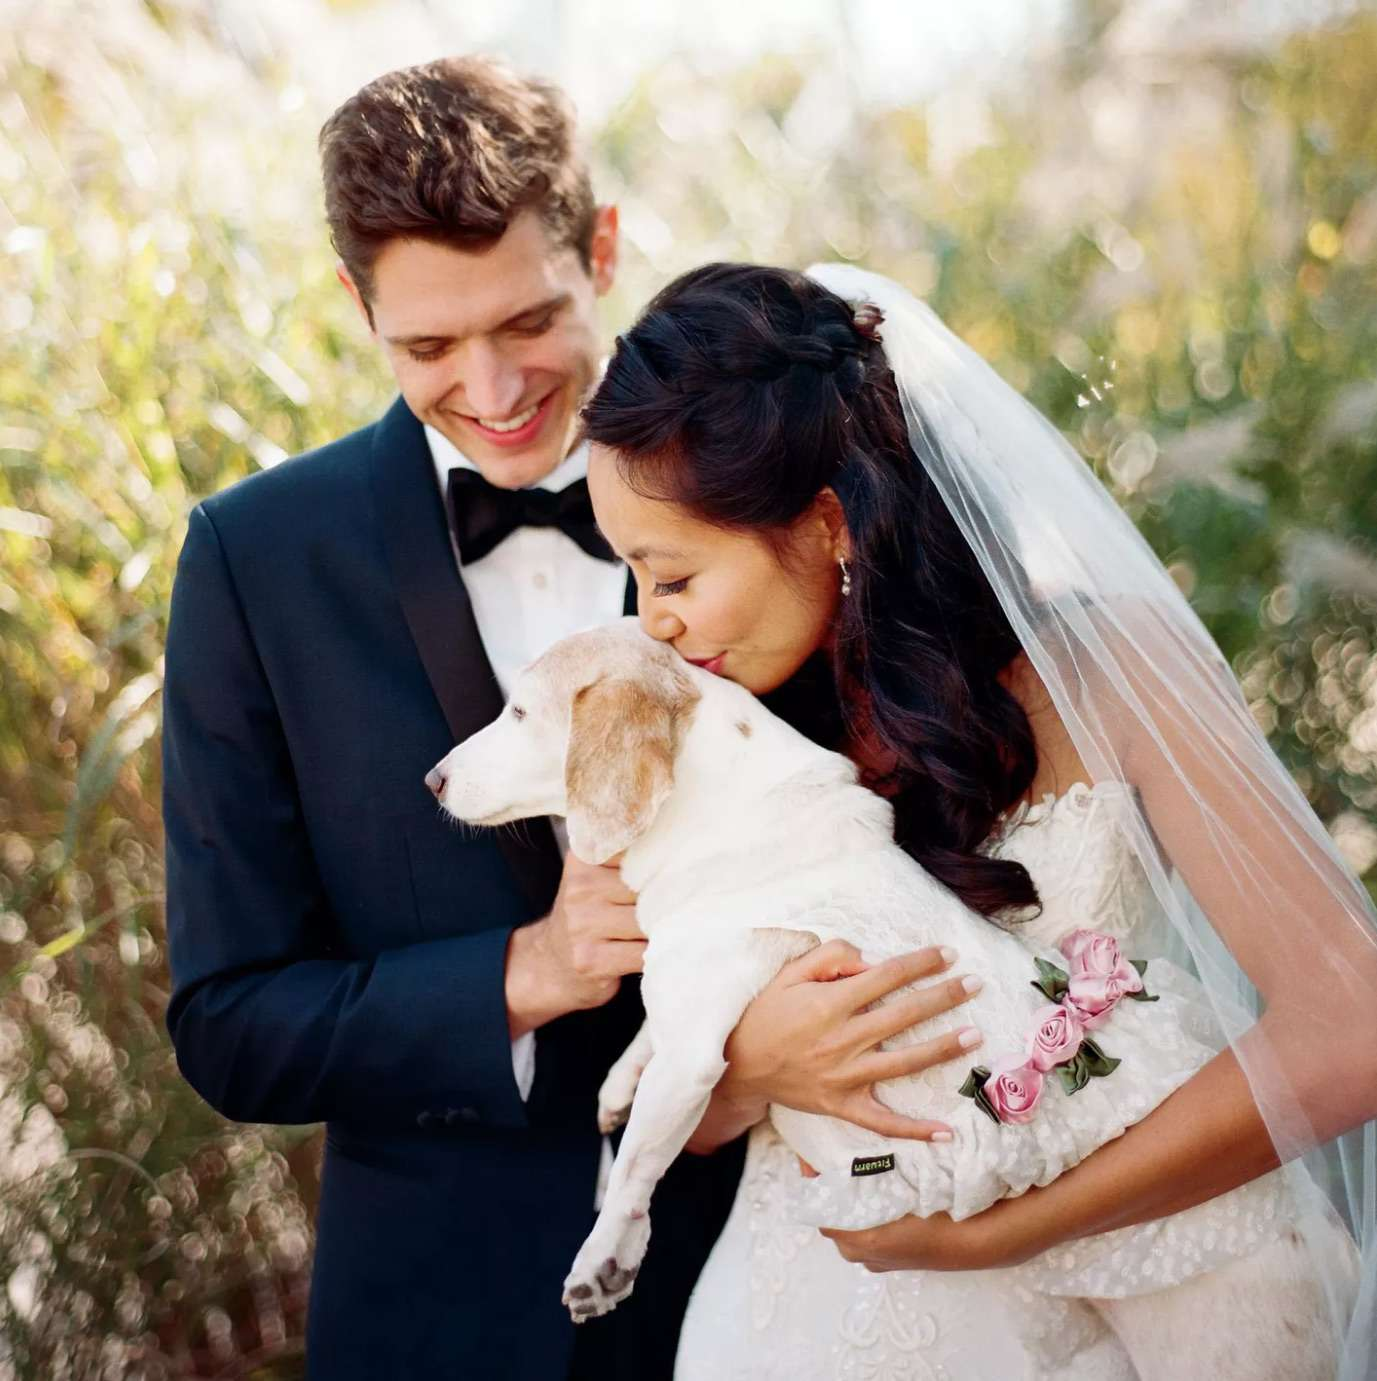 Bride kissing dog in wedding dress